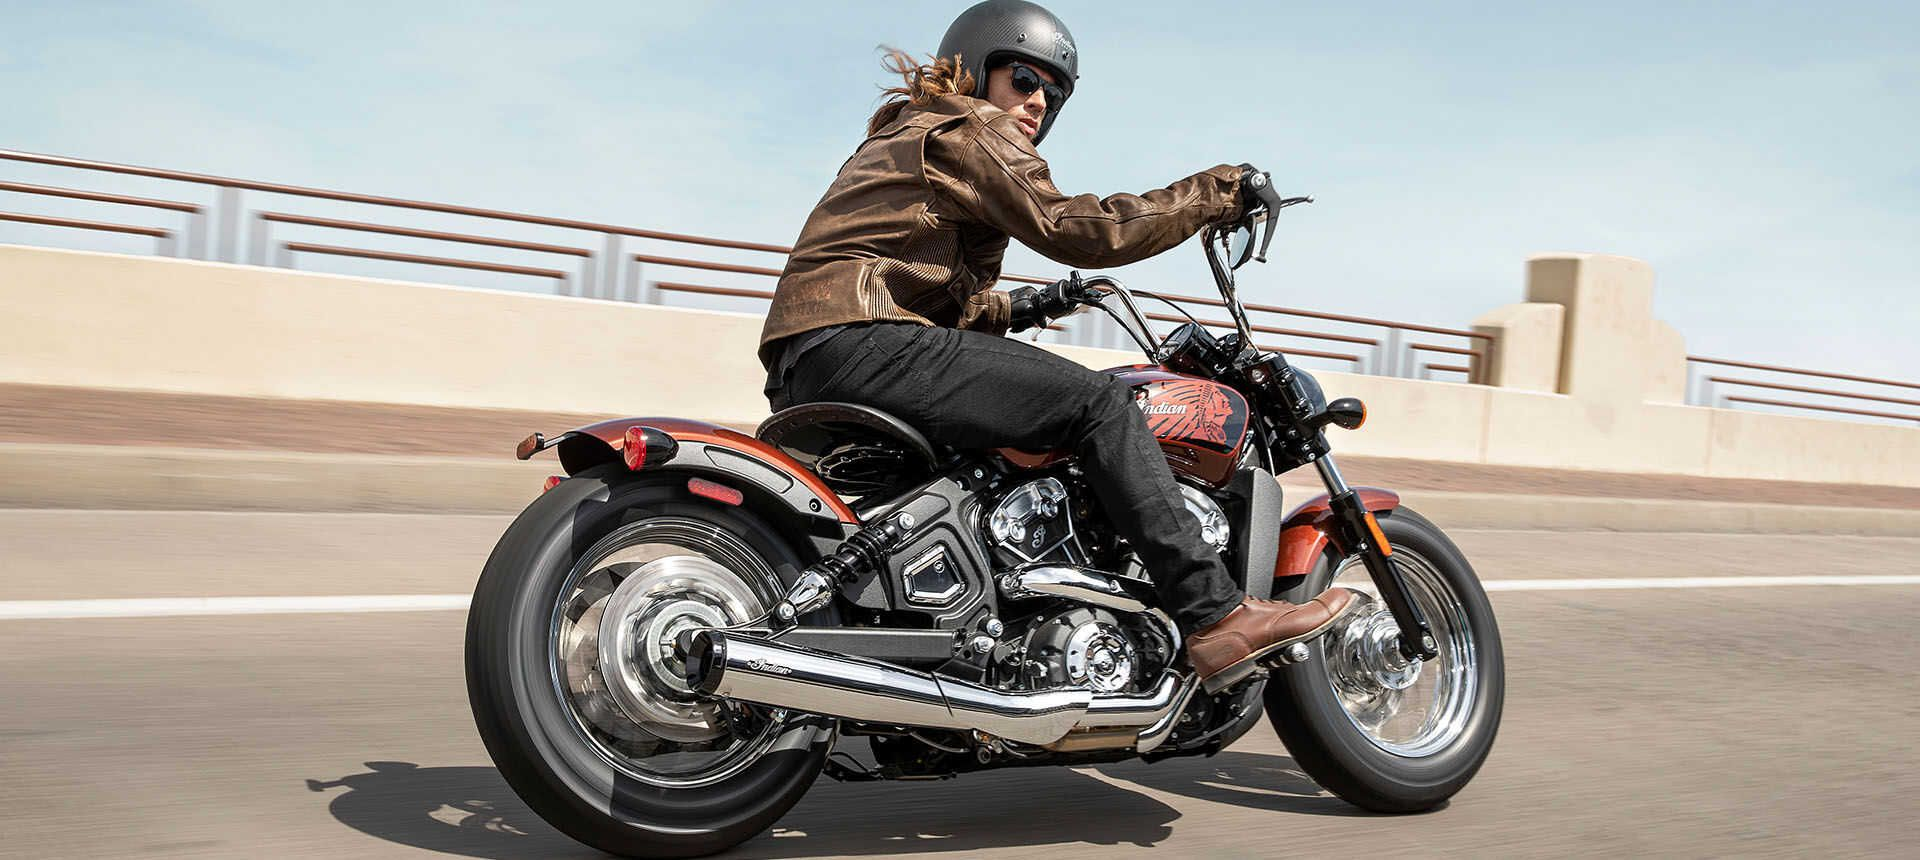 Мотоцикл Indian Scout Bobber Twenty Burnished Metallic 2020 - 6